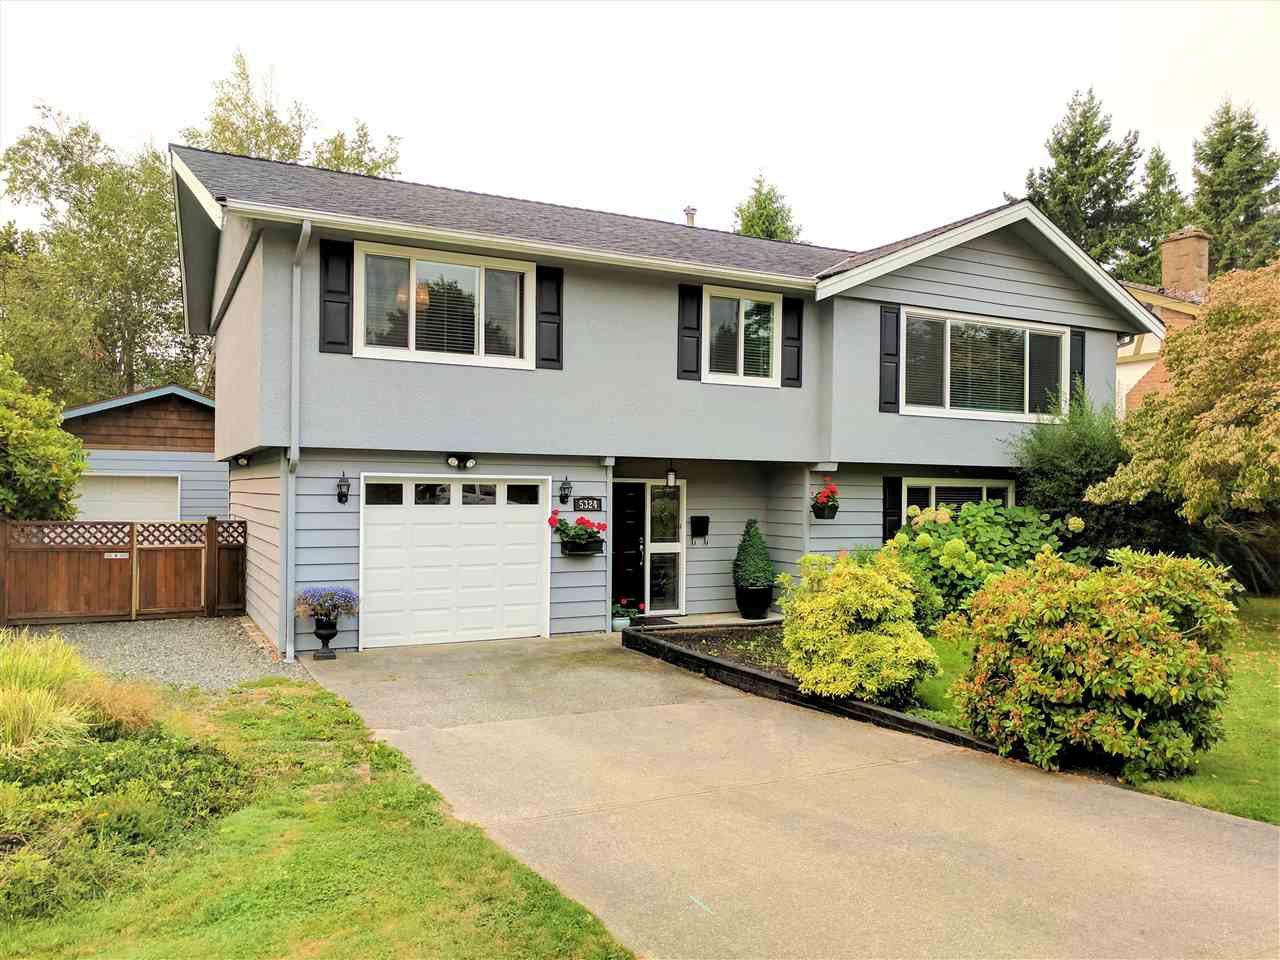 "Main Photo: 5324 1 Avenue in Delta: Pebble Hill House for sale in ""PEBBLE HILL"" (Tsawwassen)  : MLS®# R2202747"